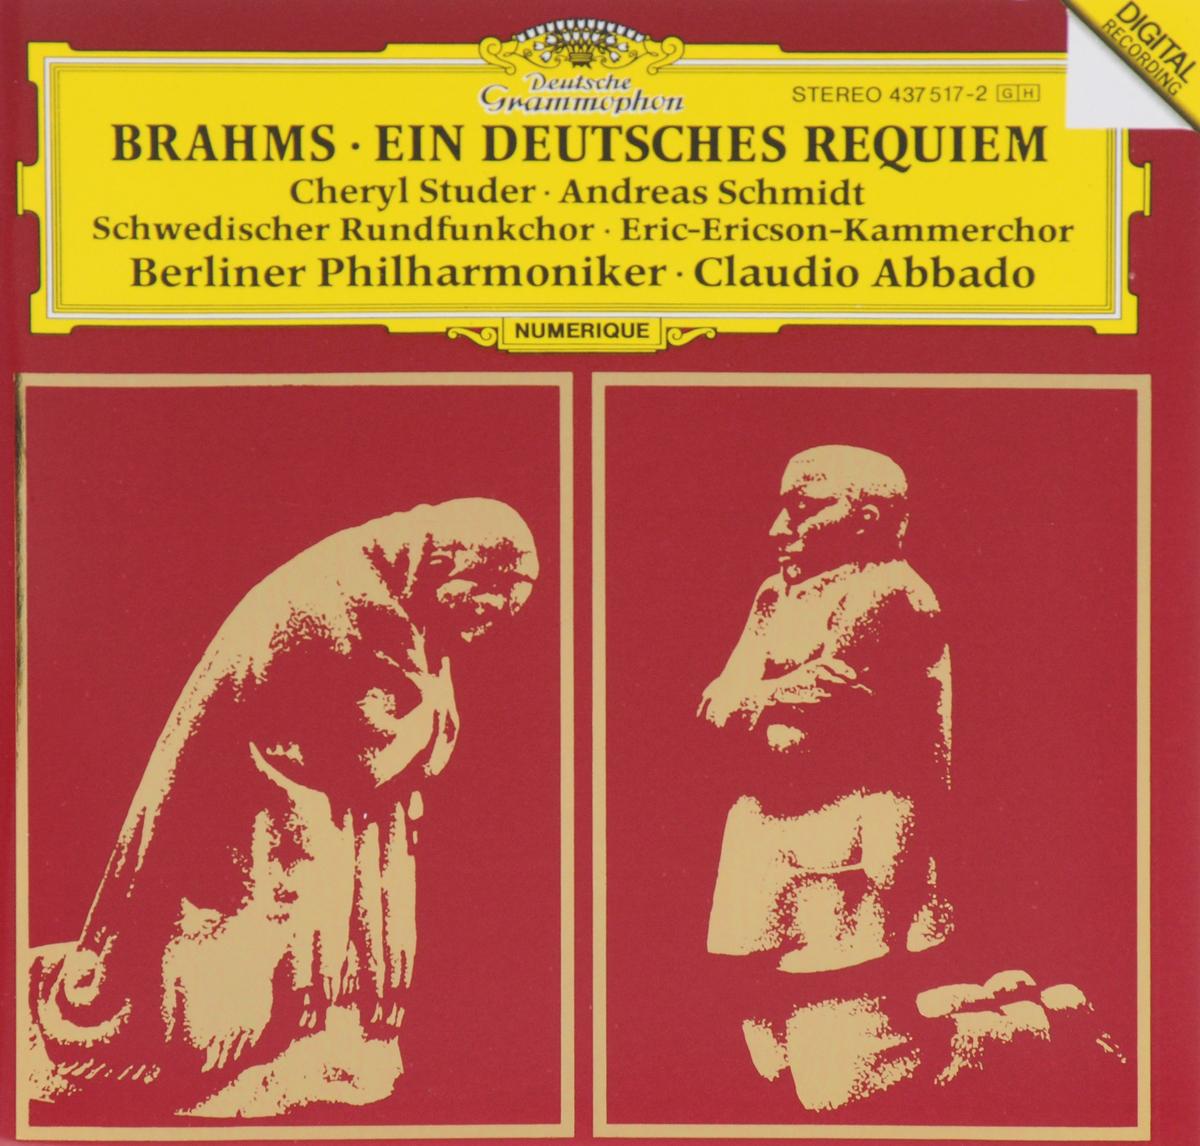 Клаудио Аббадо,Berliner Philharmoniker,Schwedischer Rundfunkchor Claudio Abbado, Berliner Philharmoniker. Brahms. Ein Deutsches Requiem саймон хелси мария тодтенхаупт йерг штродтофф berliner rundfunkchor simon halsey morgenlicht